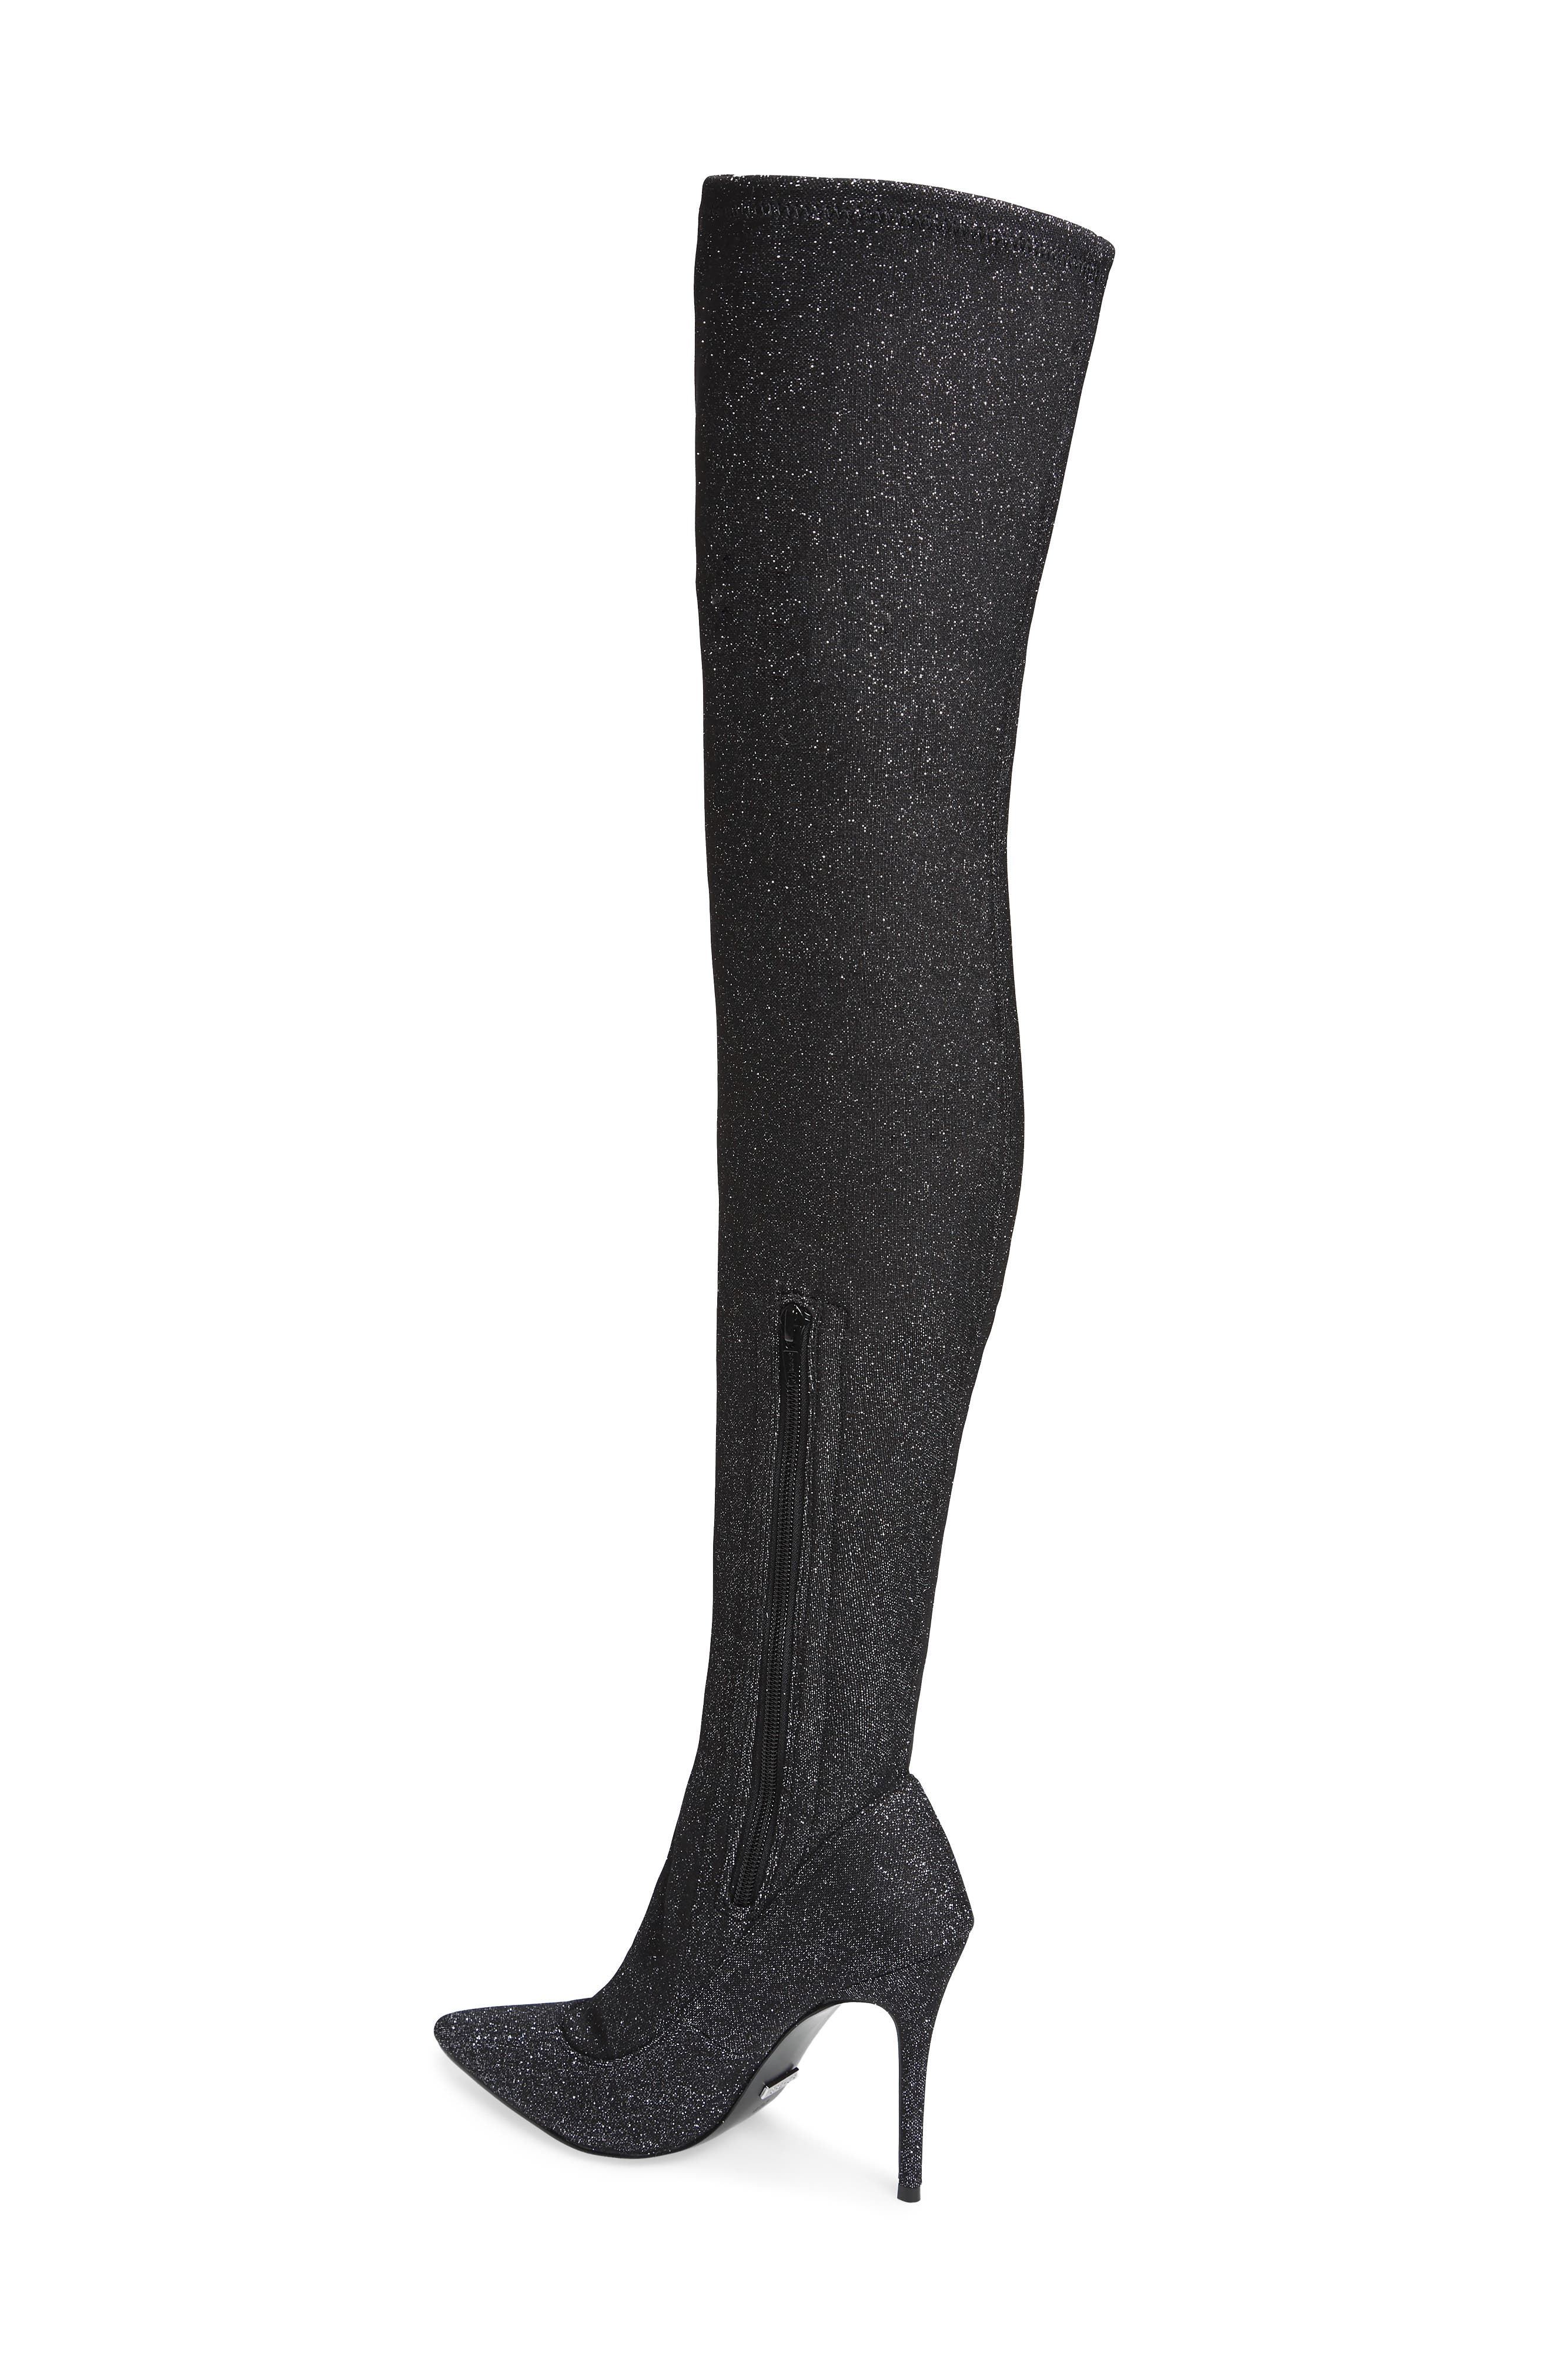 Bellini Stiletto Over the Knee Boot,                             Alternate thumbnail 2, color,                             SILVER